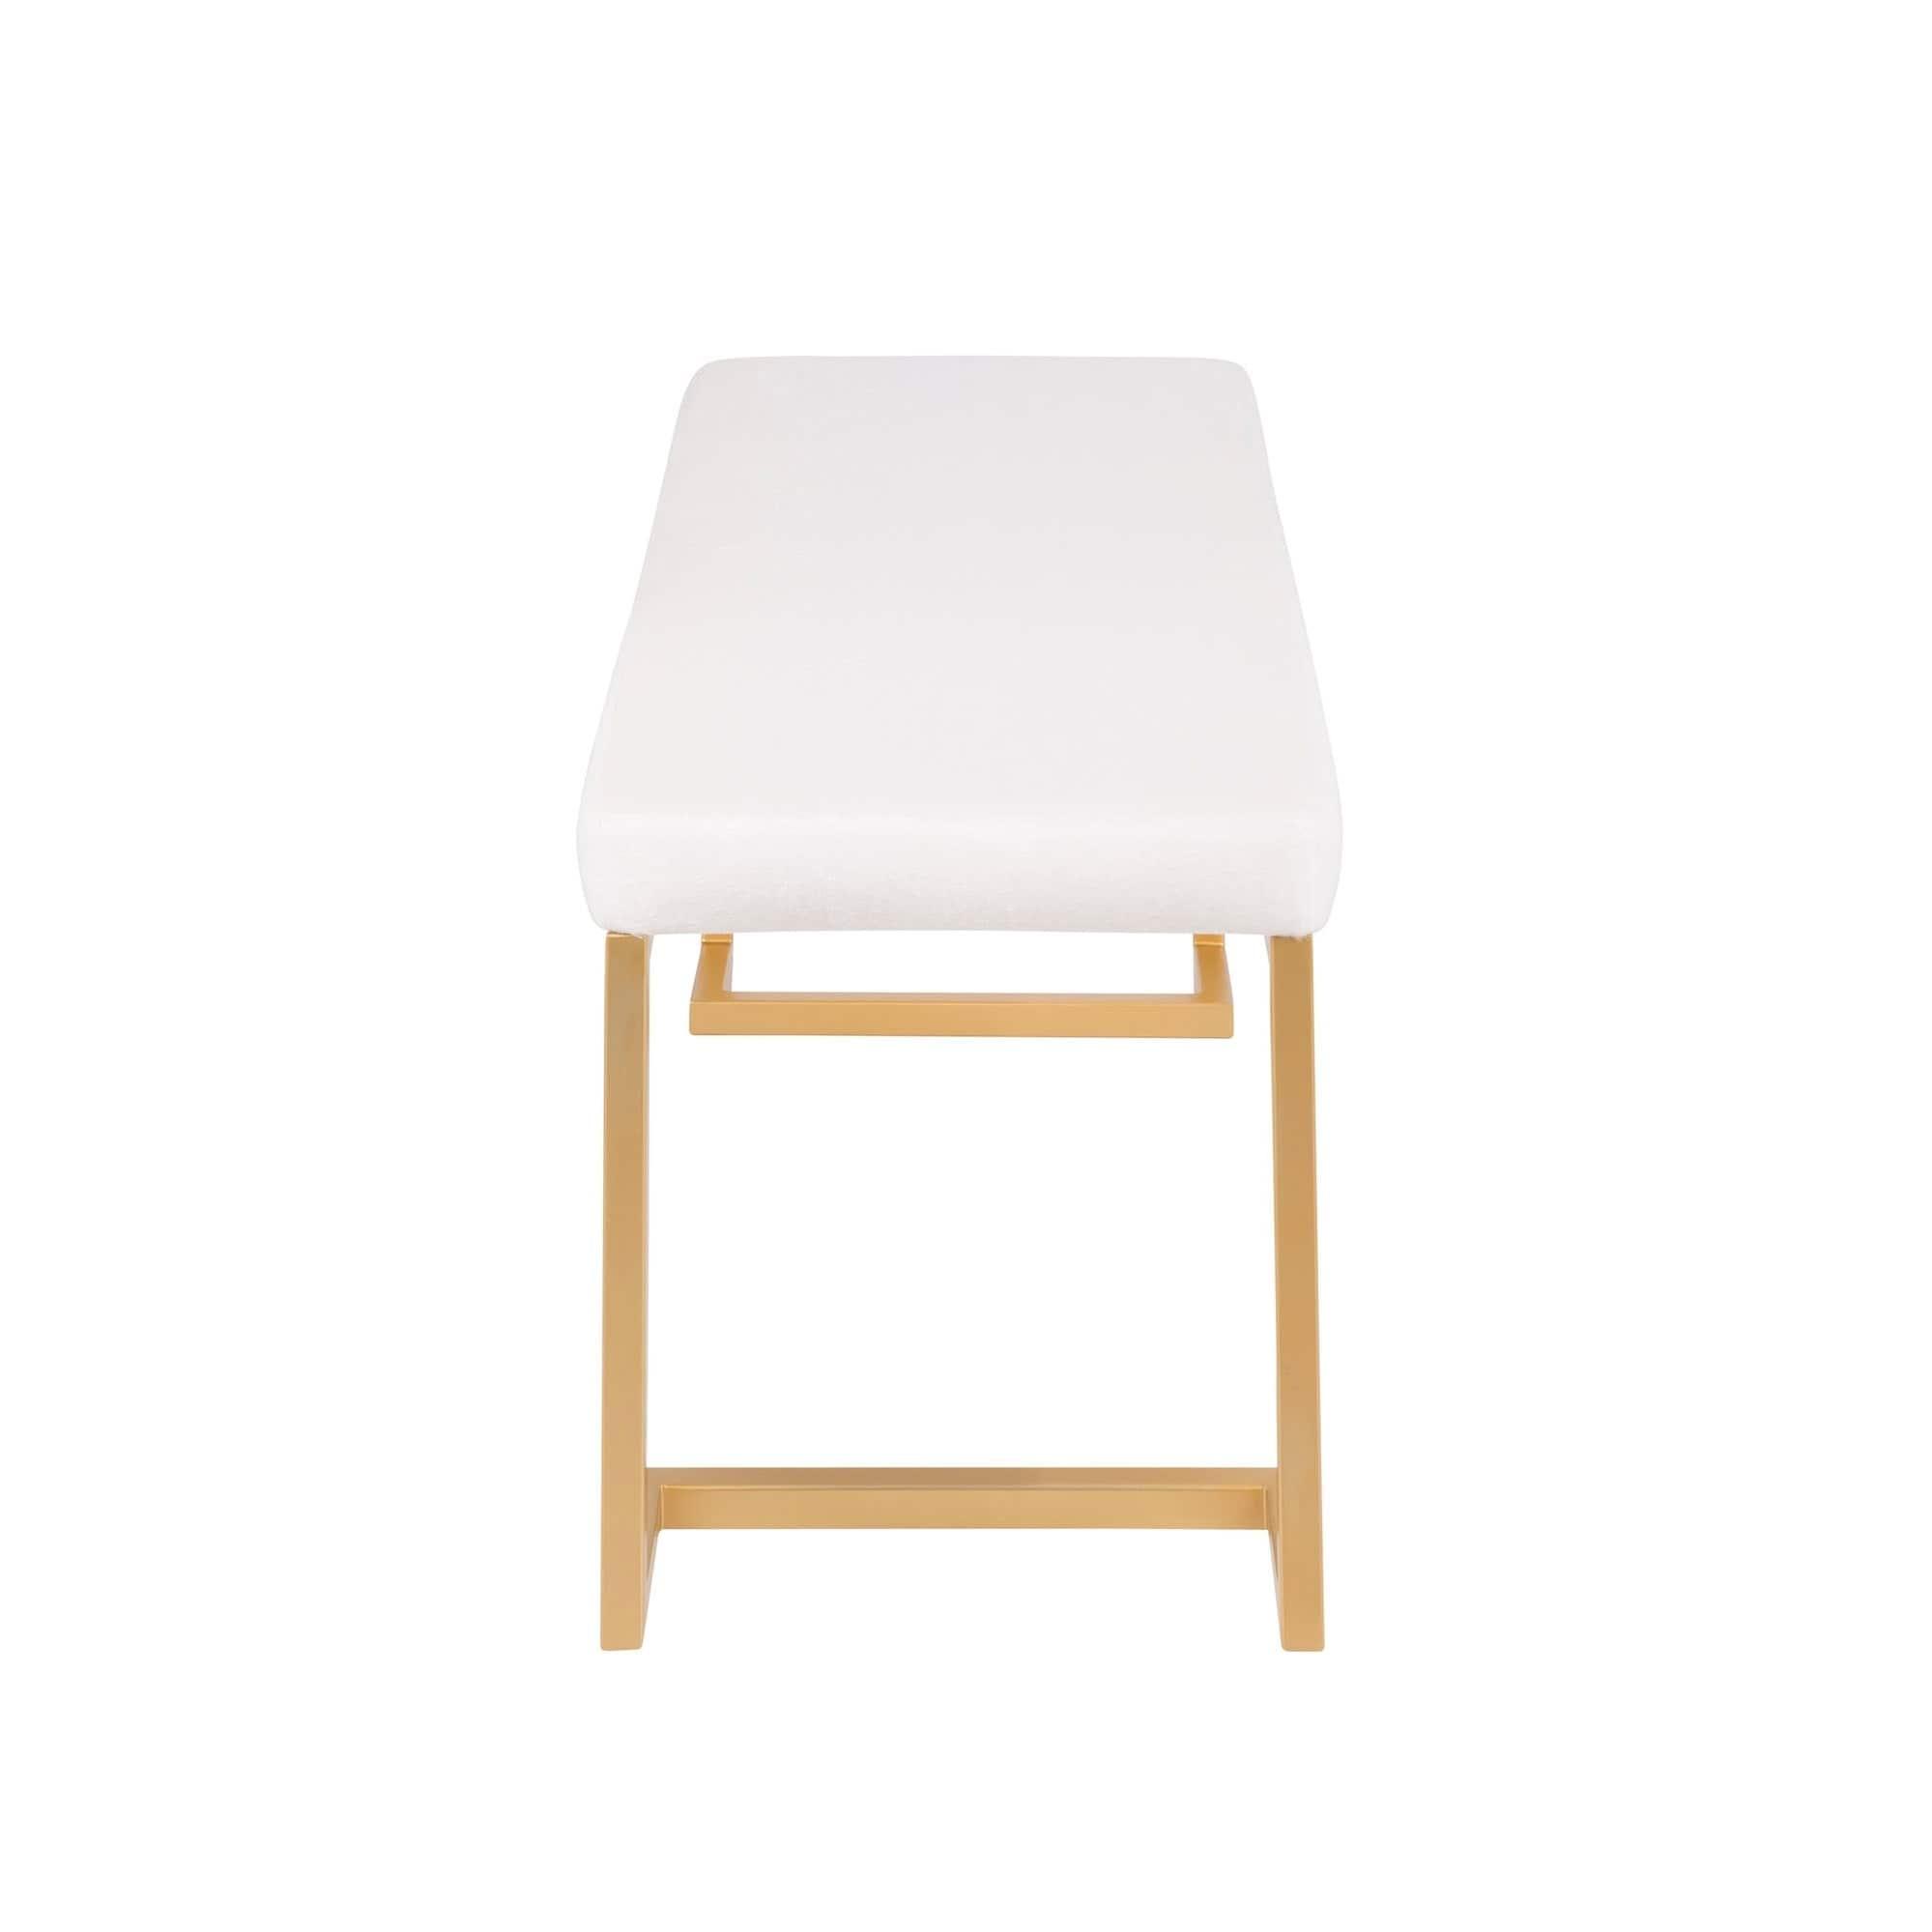 Surprising Midas Contemporary Glam Gold Dining Entryway Bench Dailytribune Chair Design For Home Dailytribuneorg